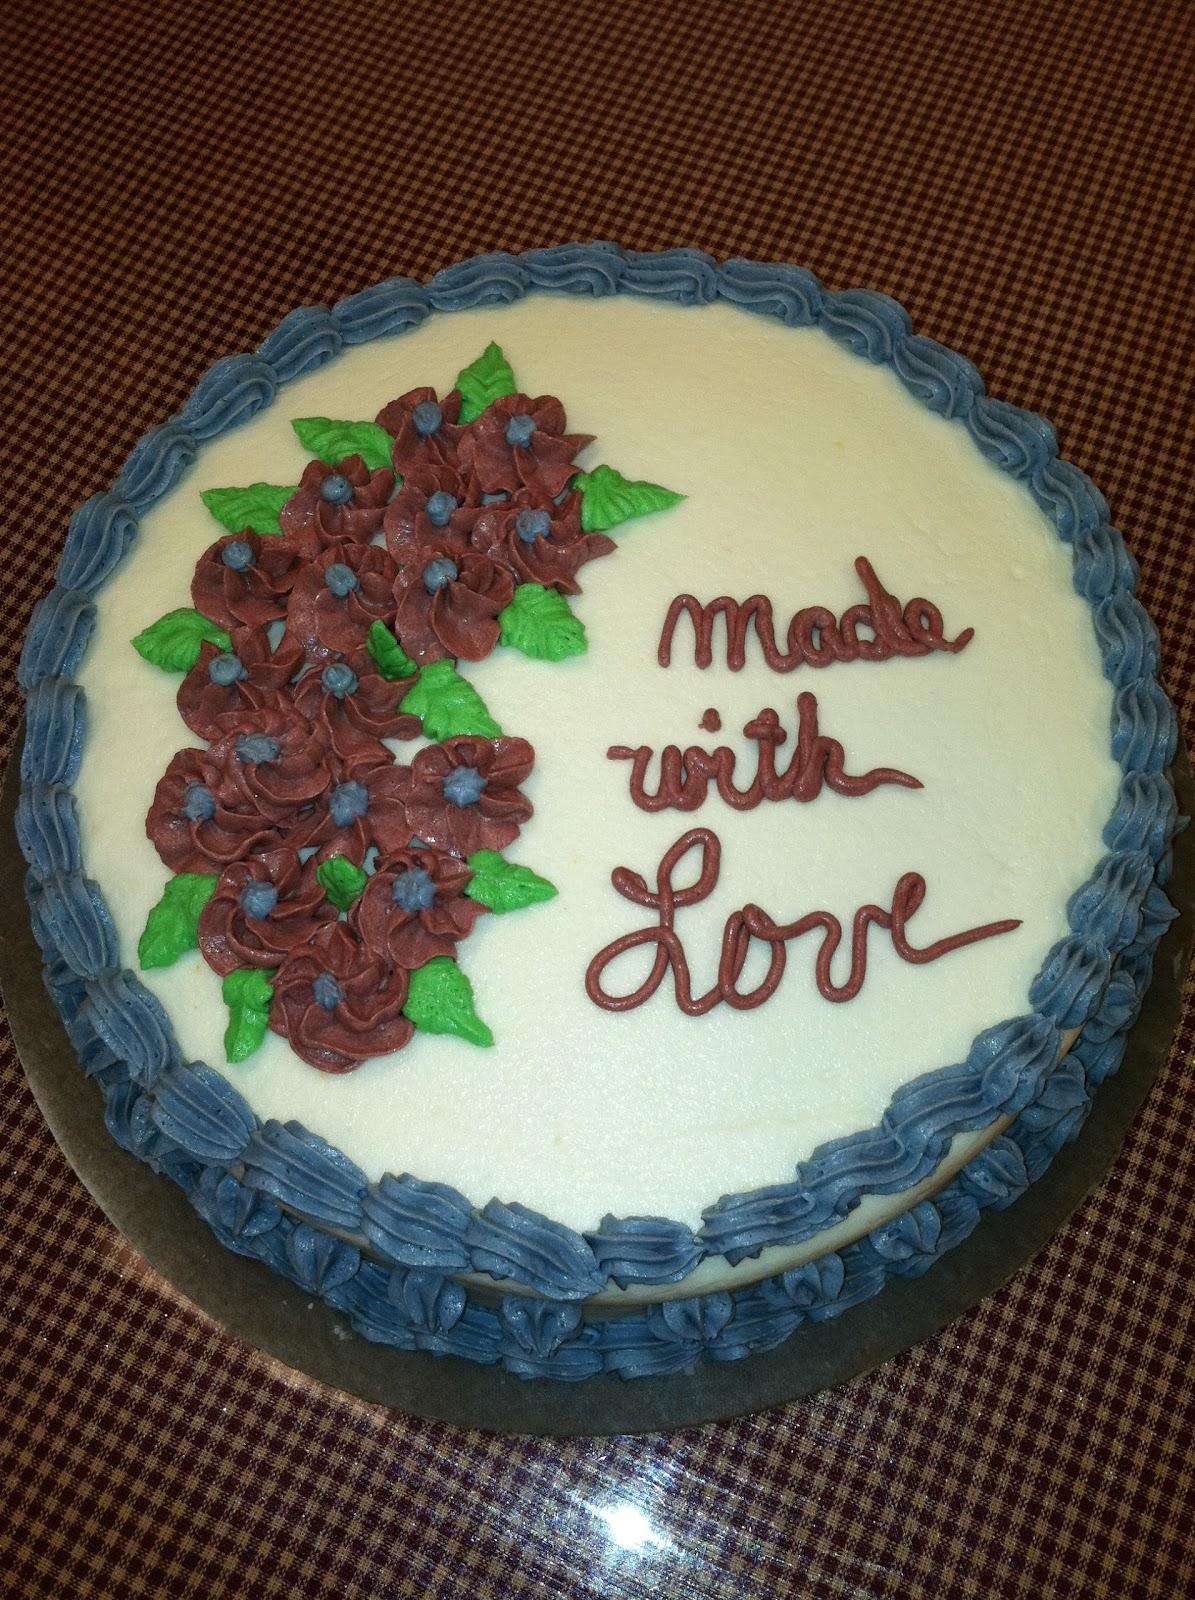 Cake Decorating And Baking Classes : Ferrellgraph-x: Cake decorating class